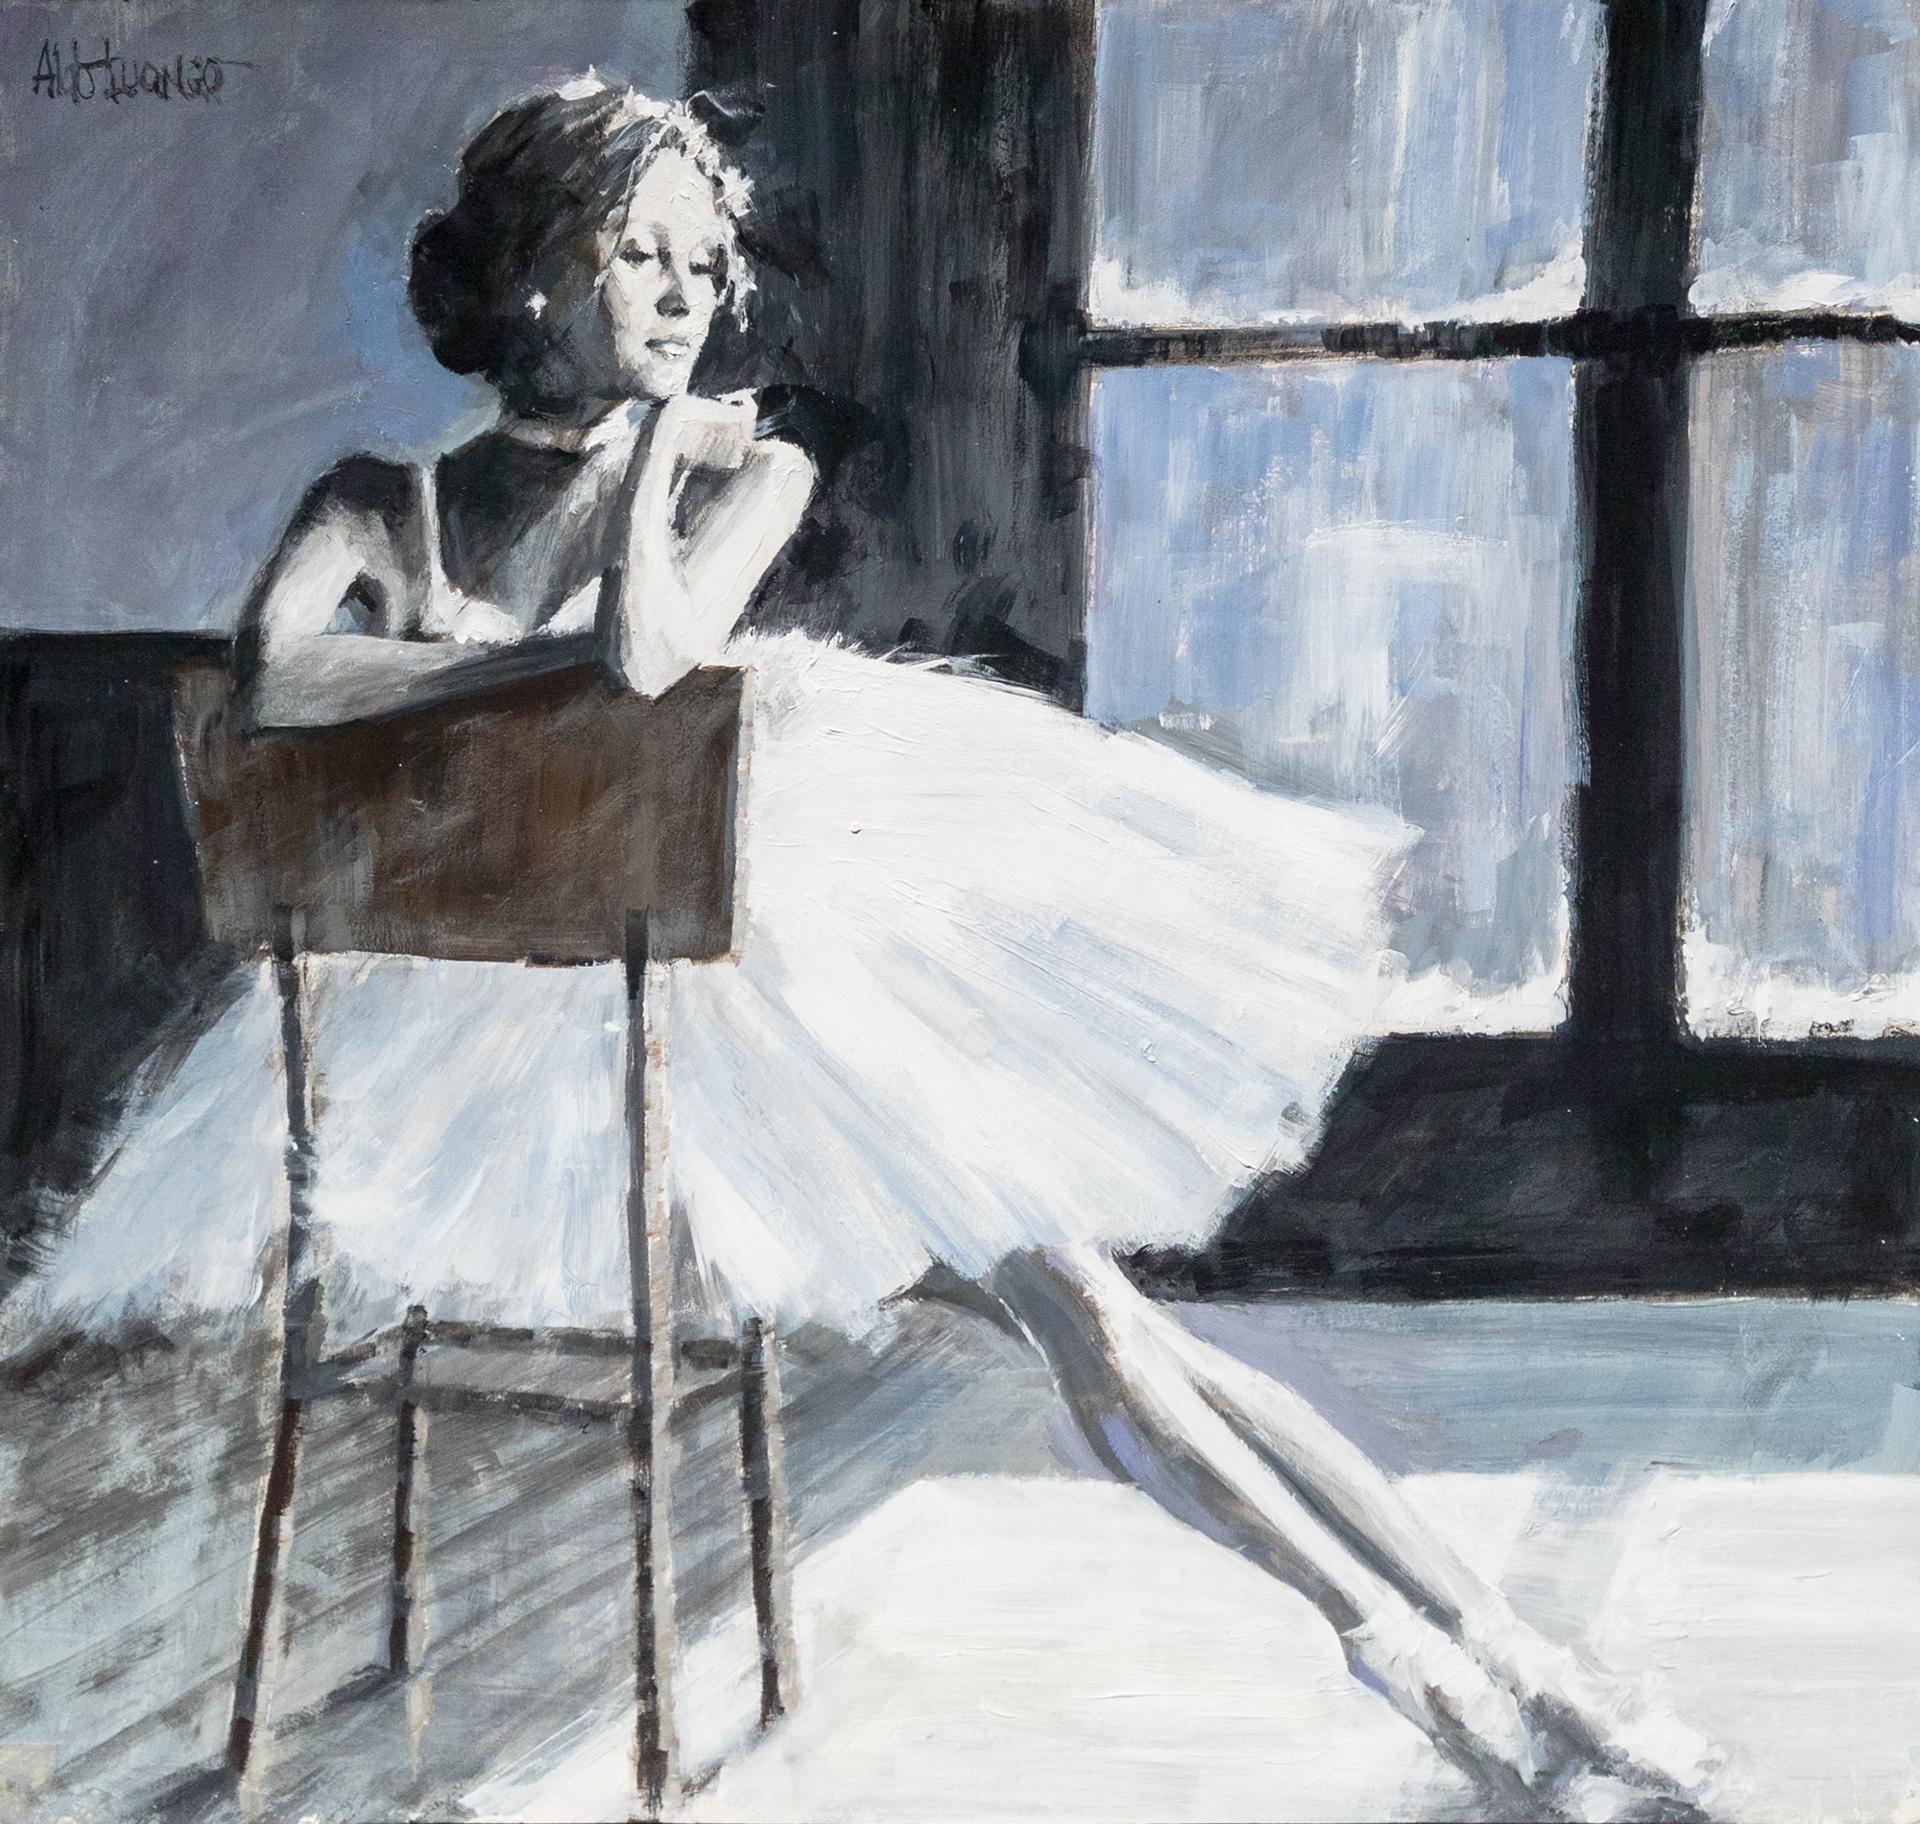 Winter Light II (Study) by Aldo Luongo